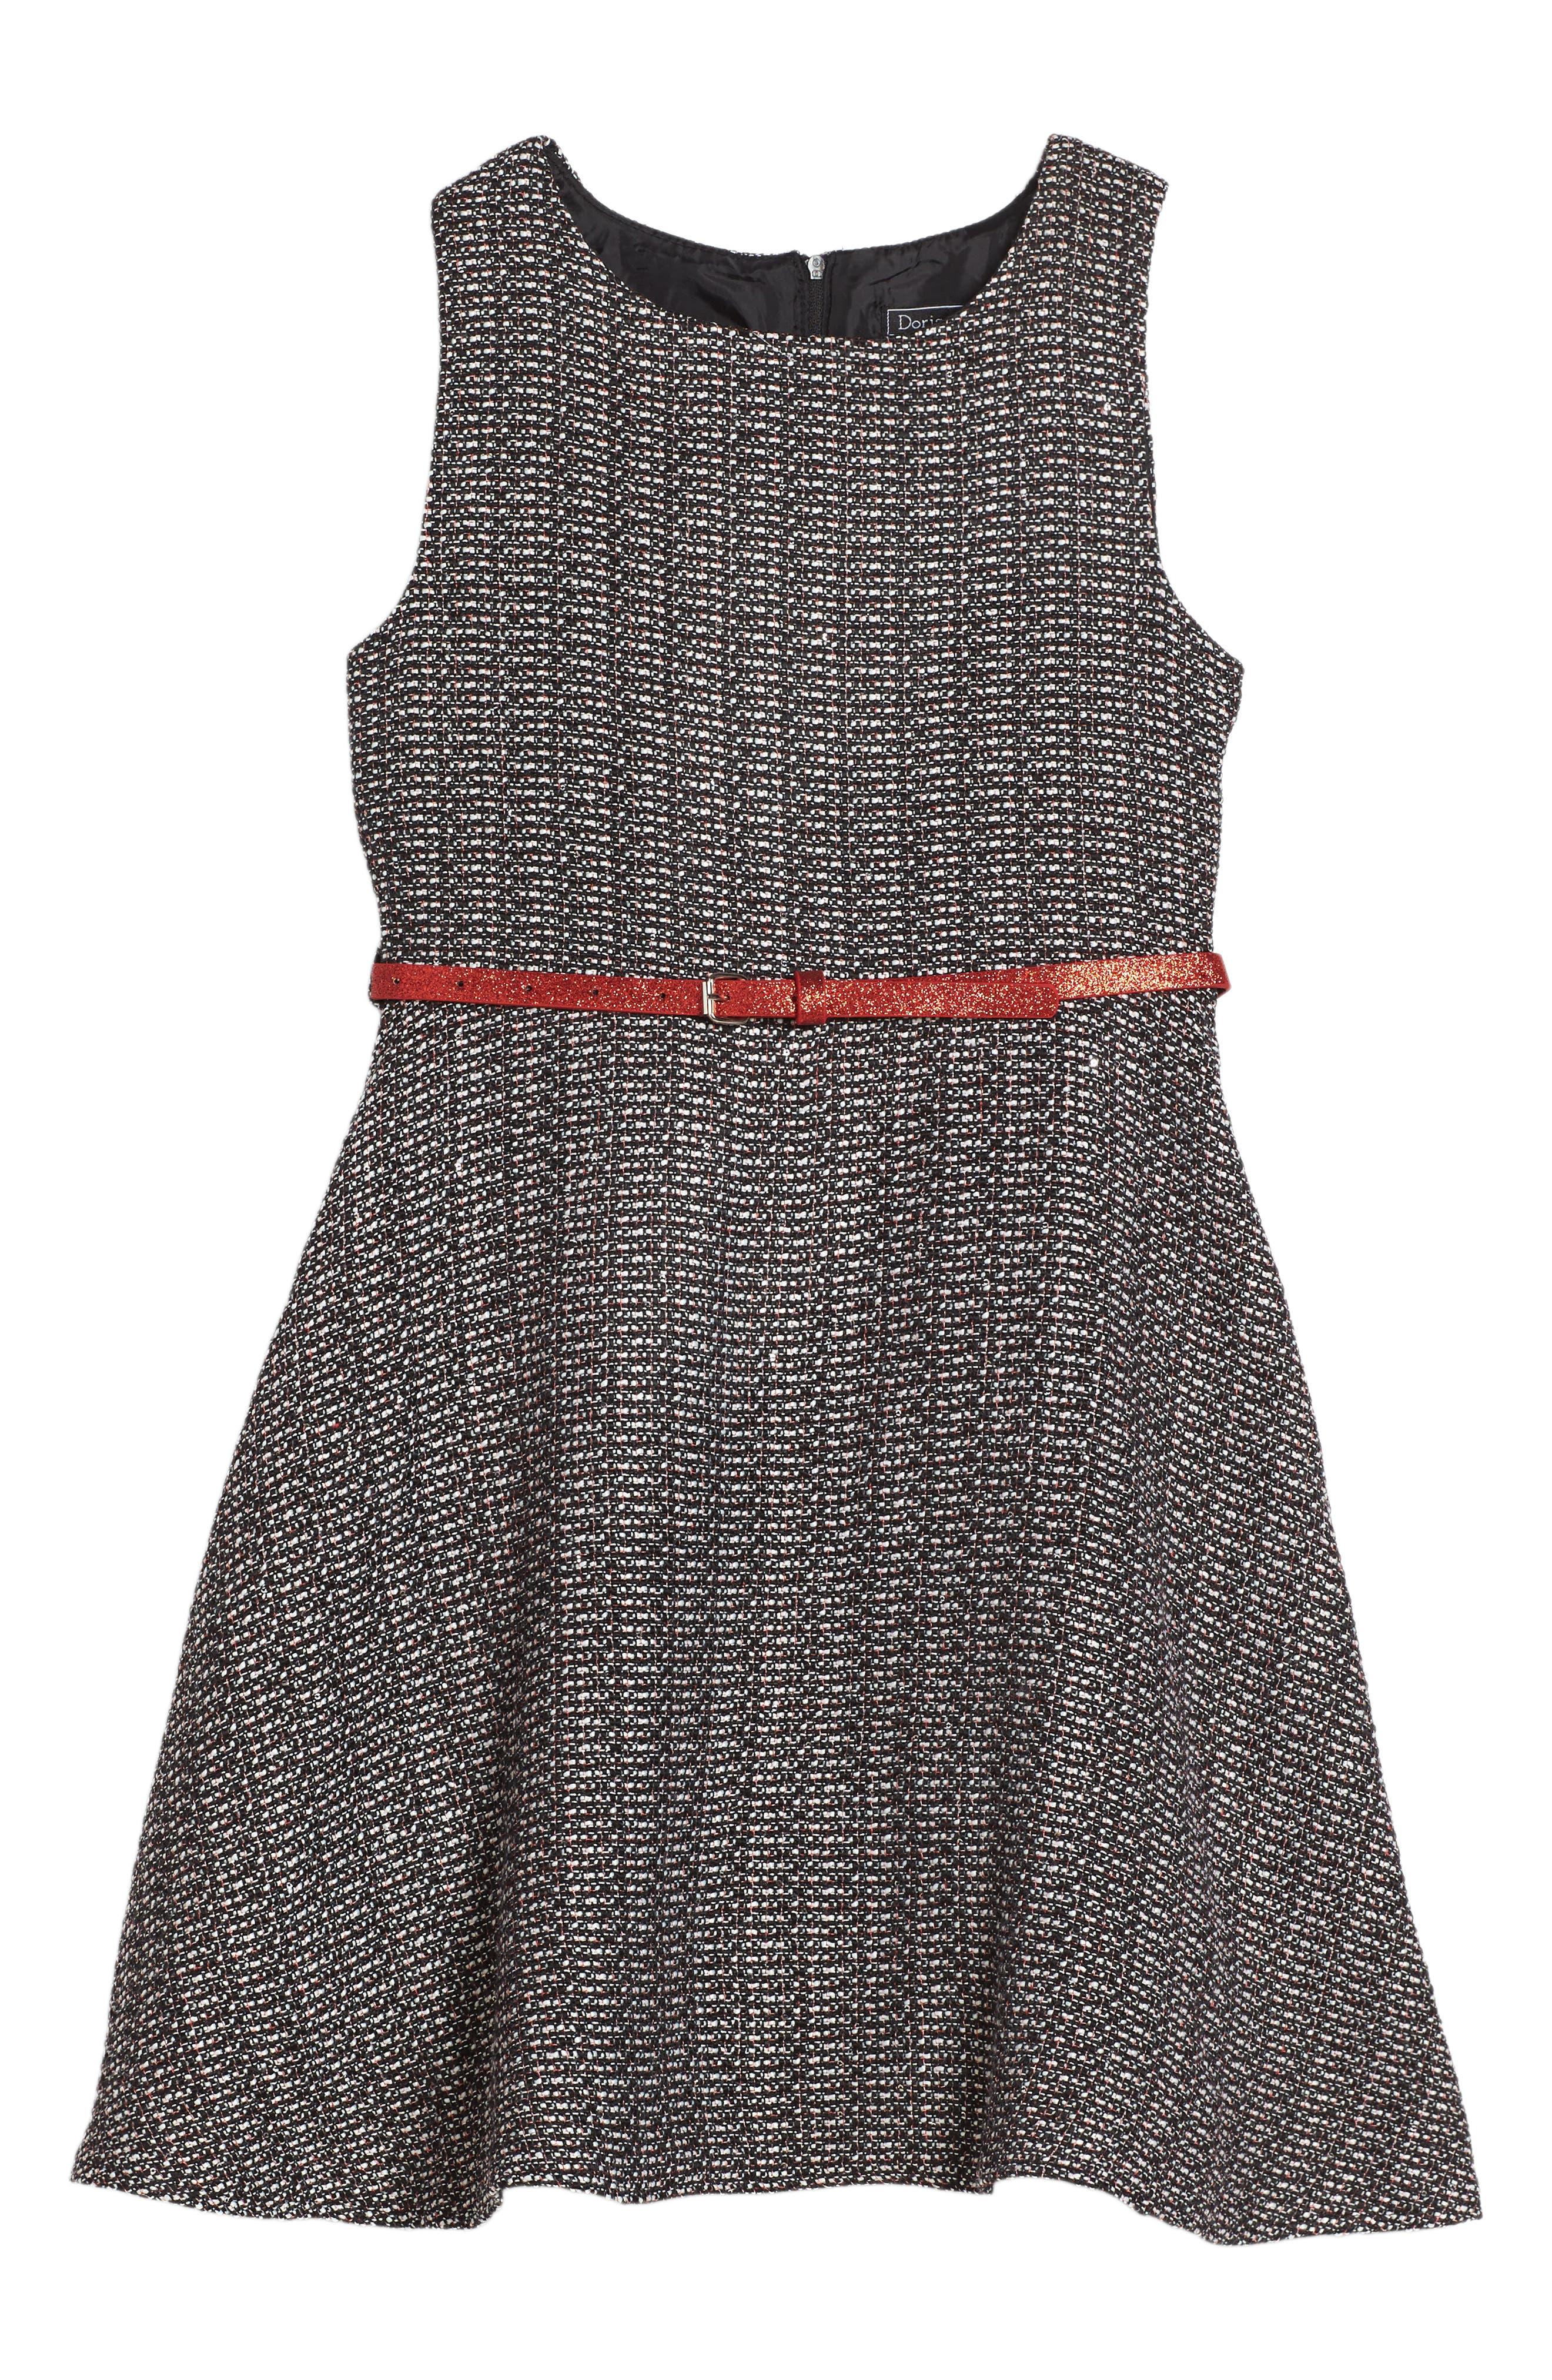 Main Image - Dorissa Ella Tweed Dress (Big Girls)